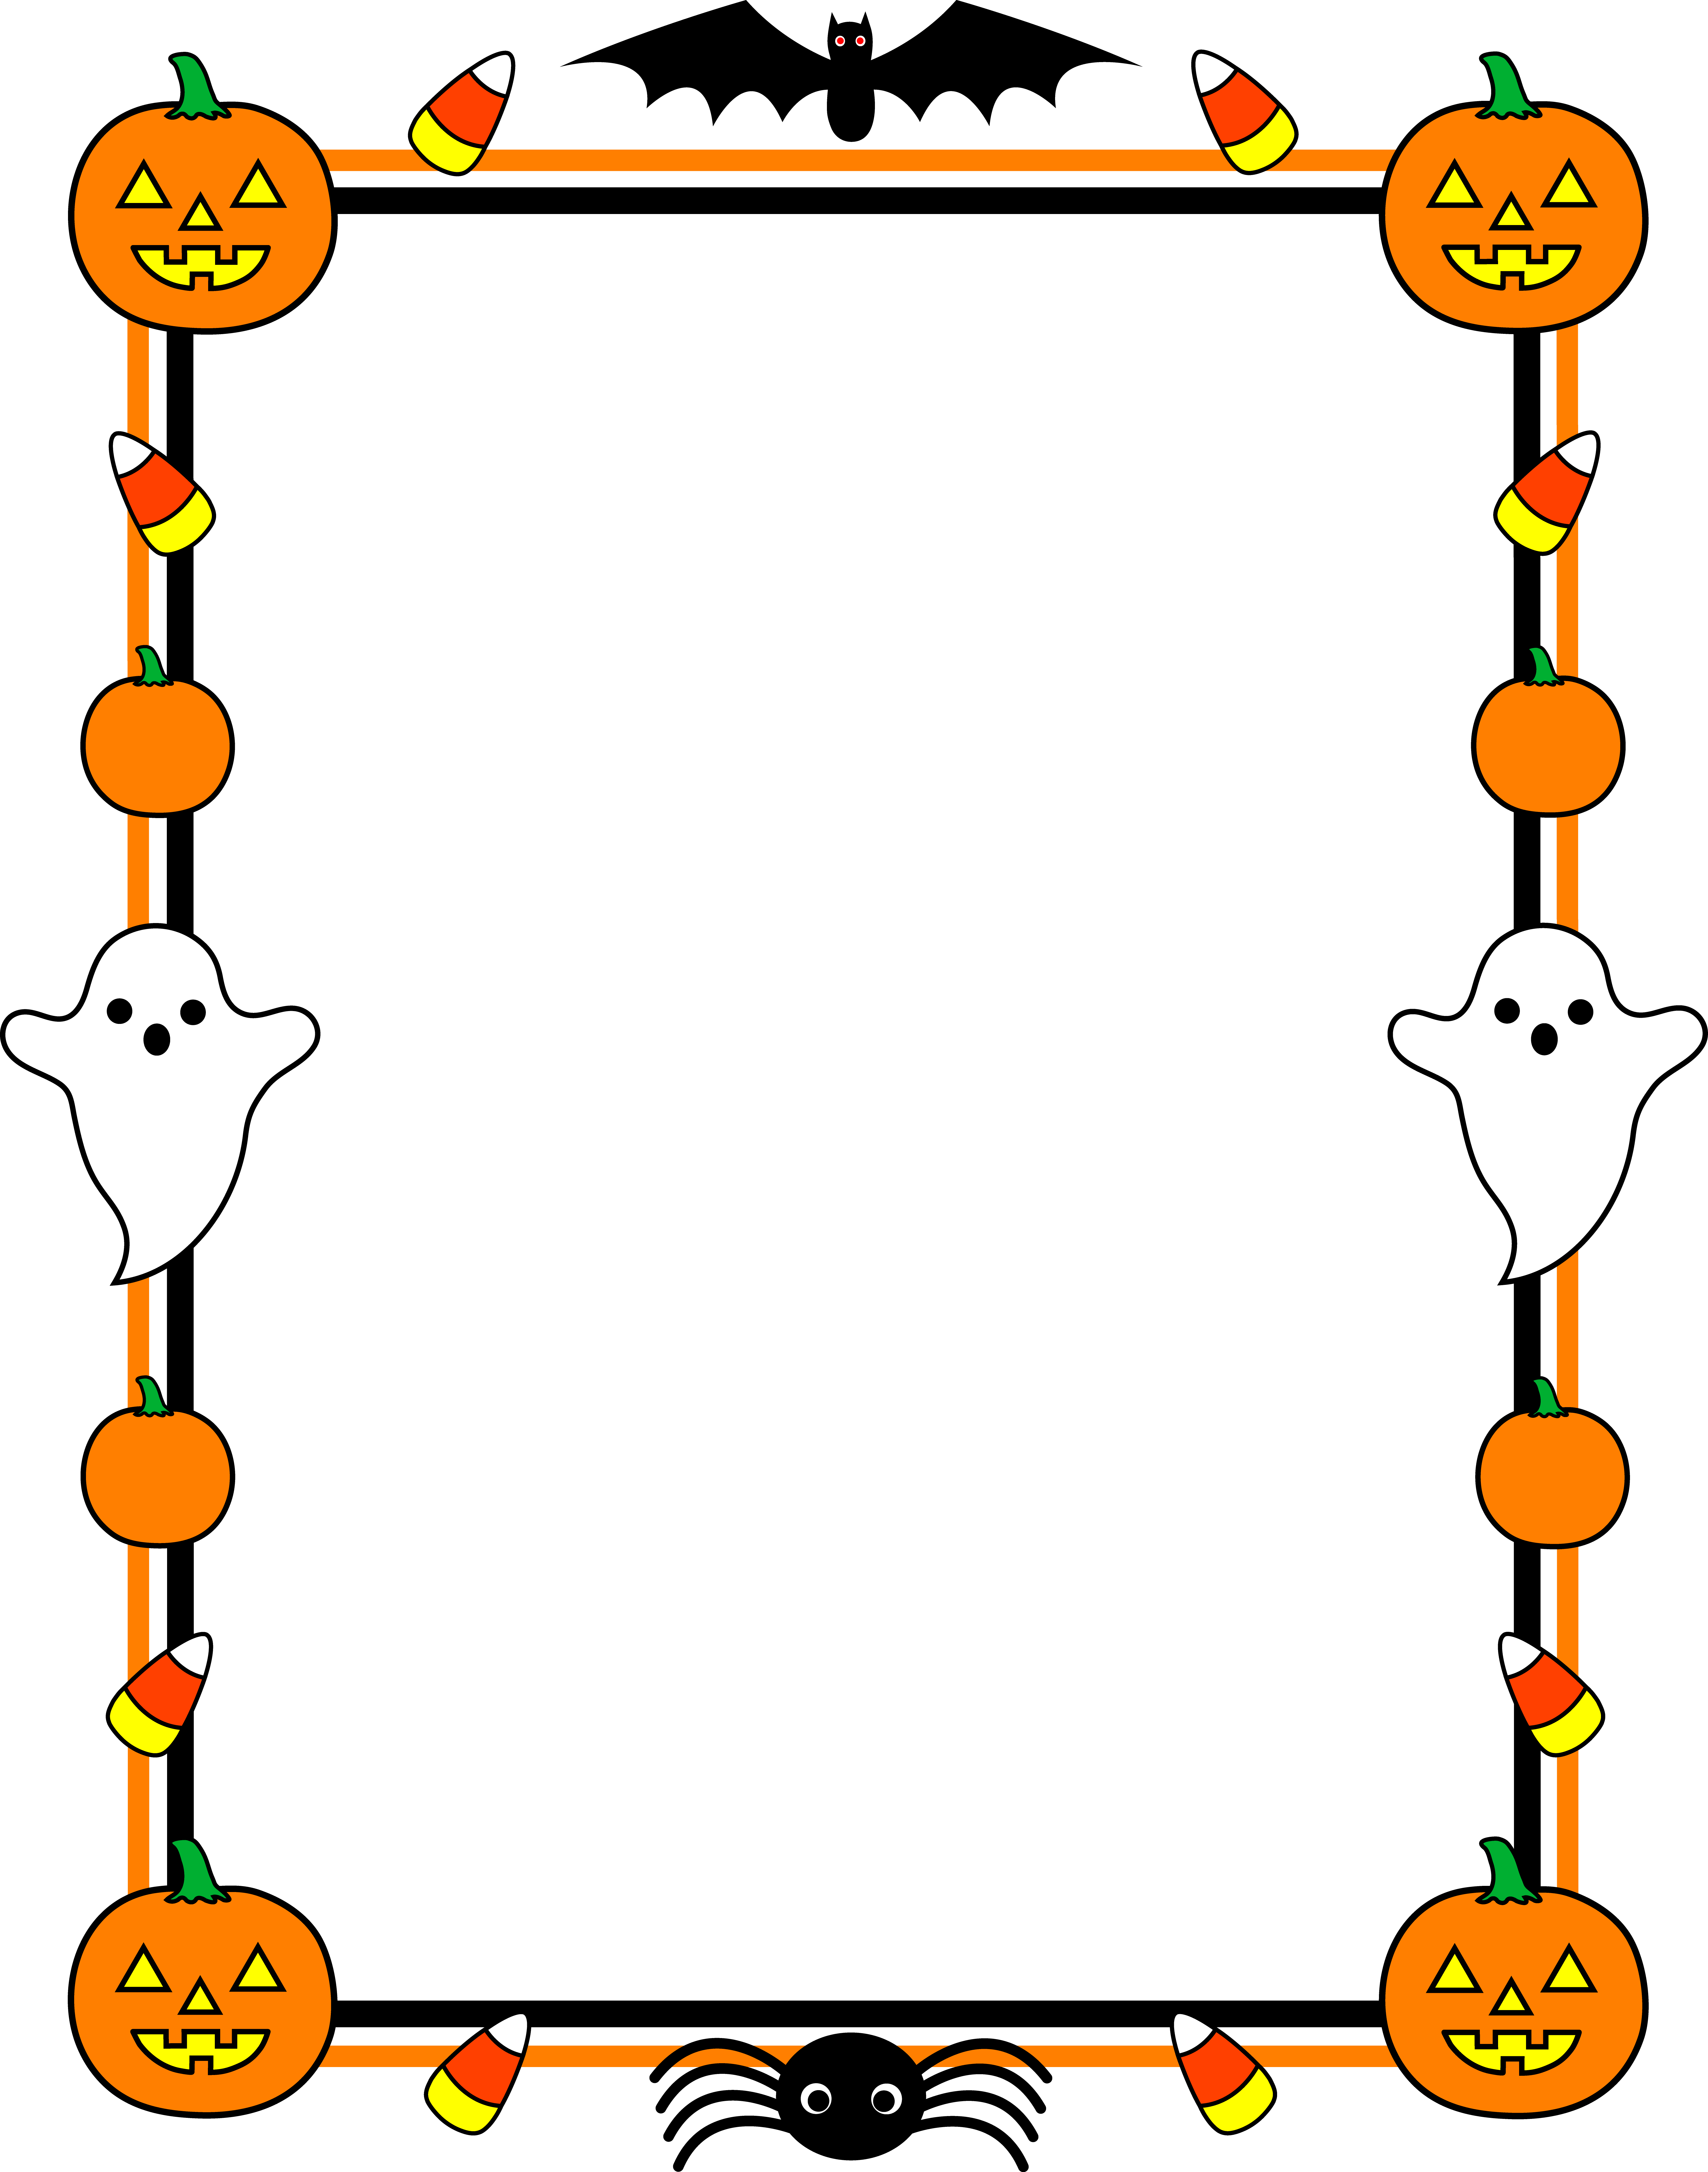 Children Border Clip Art | Clipart Panda - Free Clipart Images